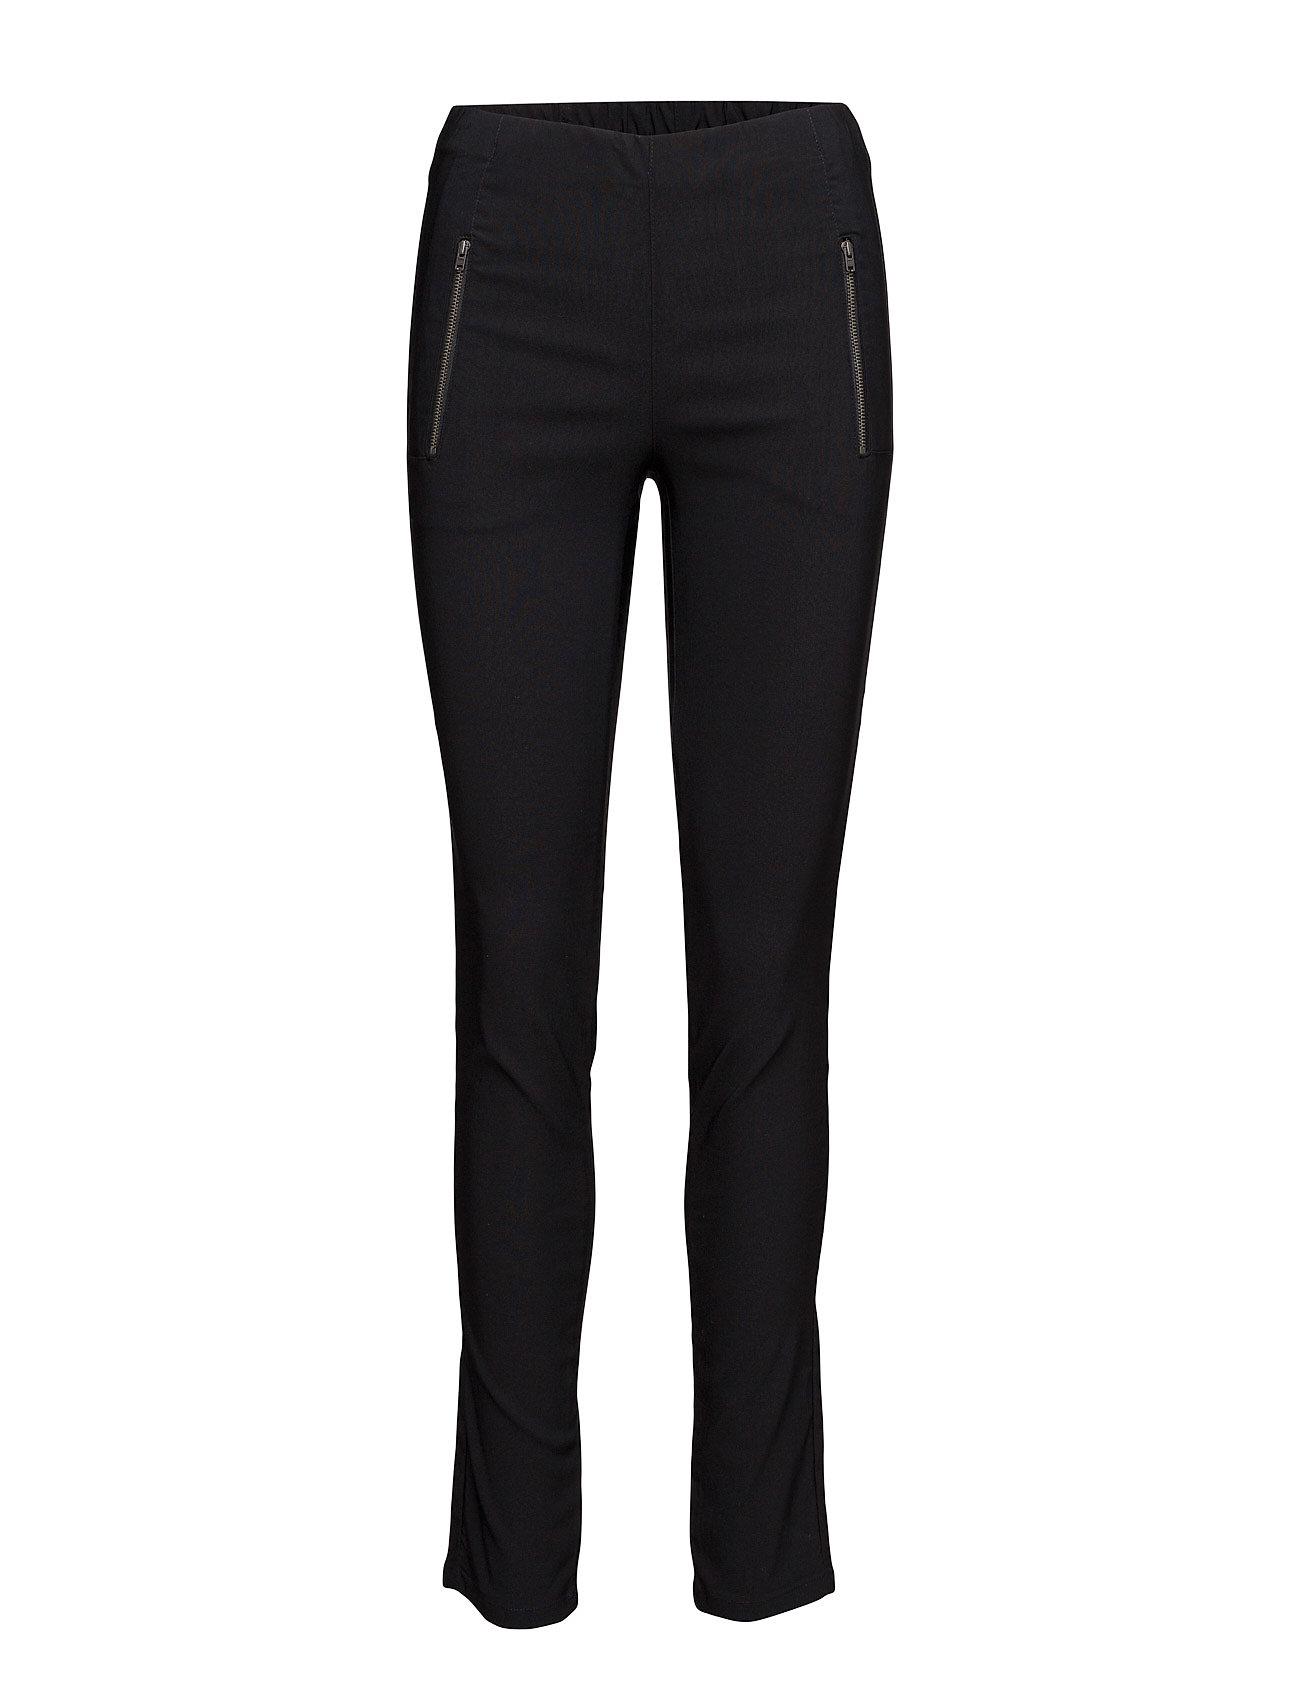 Masai Pearl trousers ew BASIC Byxor